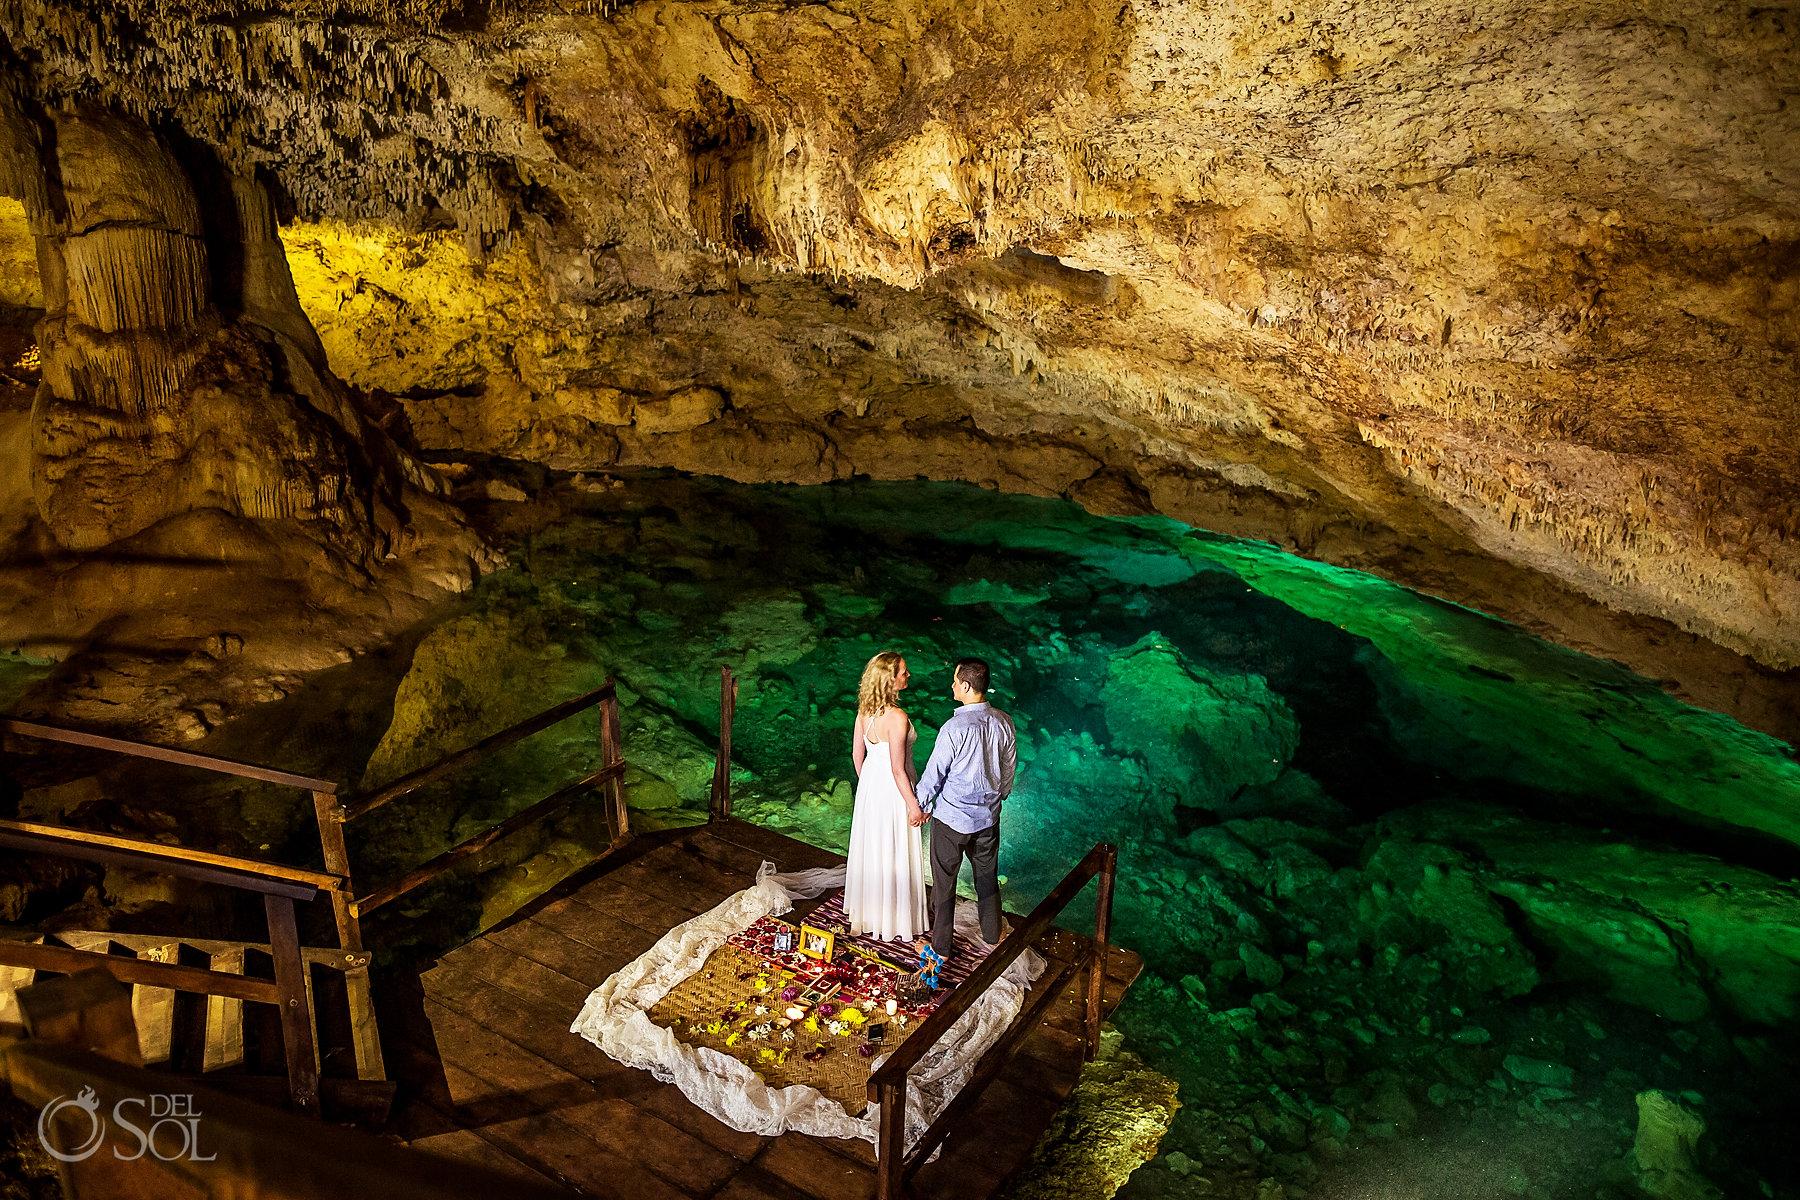 Cenote empowering ceremony birthday celebration Yucatan Mexico